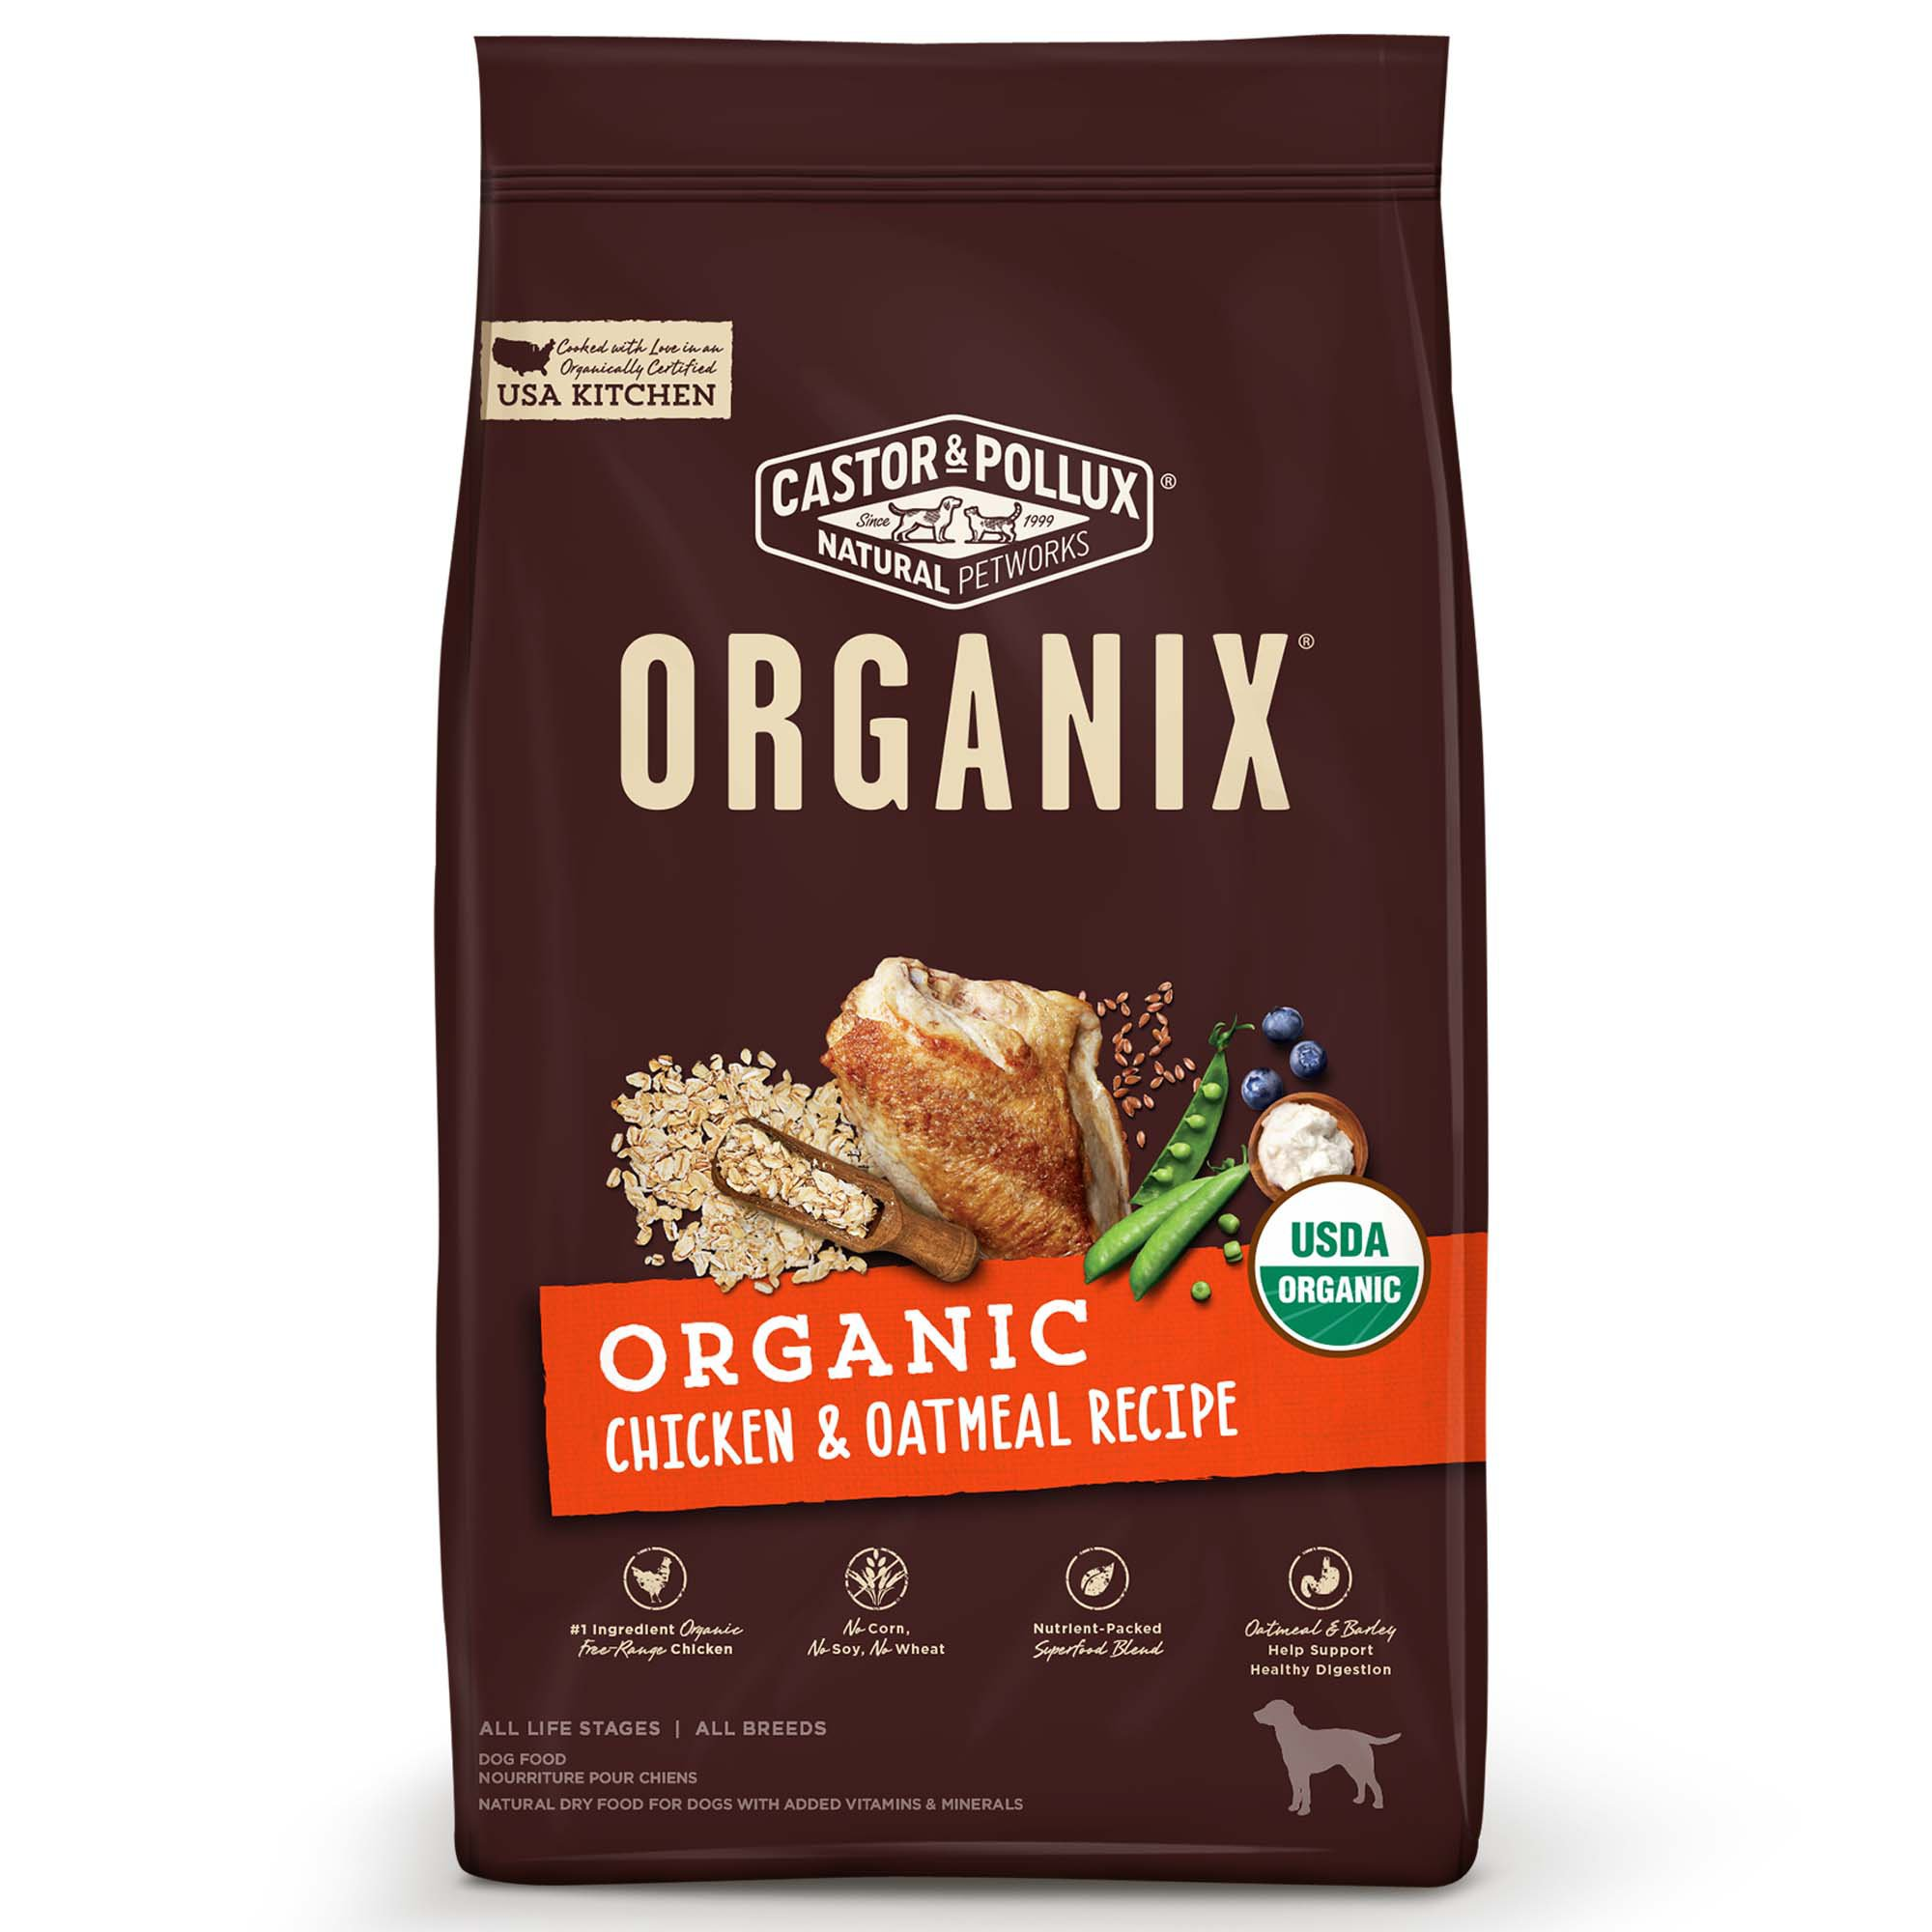 Image of Castor & Pollux Organix Organic Chicken & Oatmeal Recipe Dry Dog Food, 10 lbs.